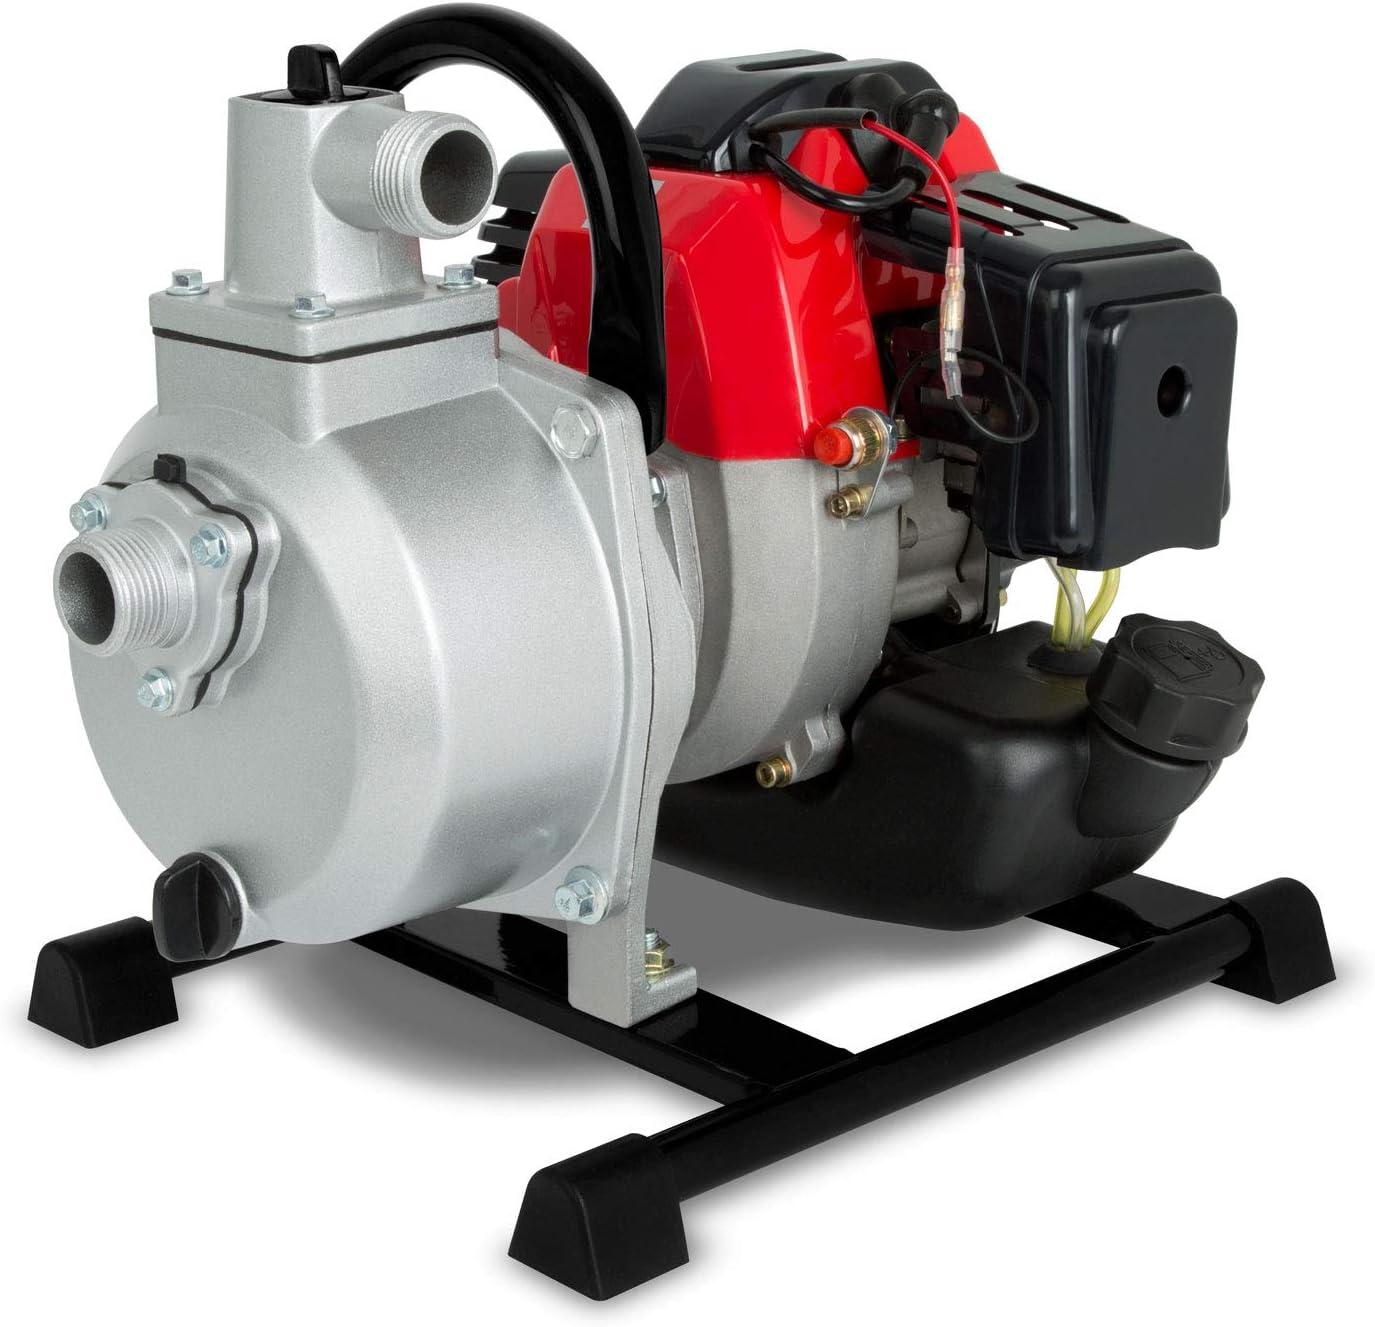 Eberth 1 Benzin Wasserpumpe 12 500 L H 2 Ps Benzinmotor 1 Zoll Anschluß 17 5m Förderhöhe 7m Ansaughöhe Seilzugstart Alle Produkte